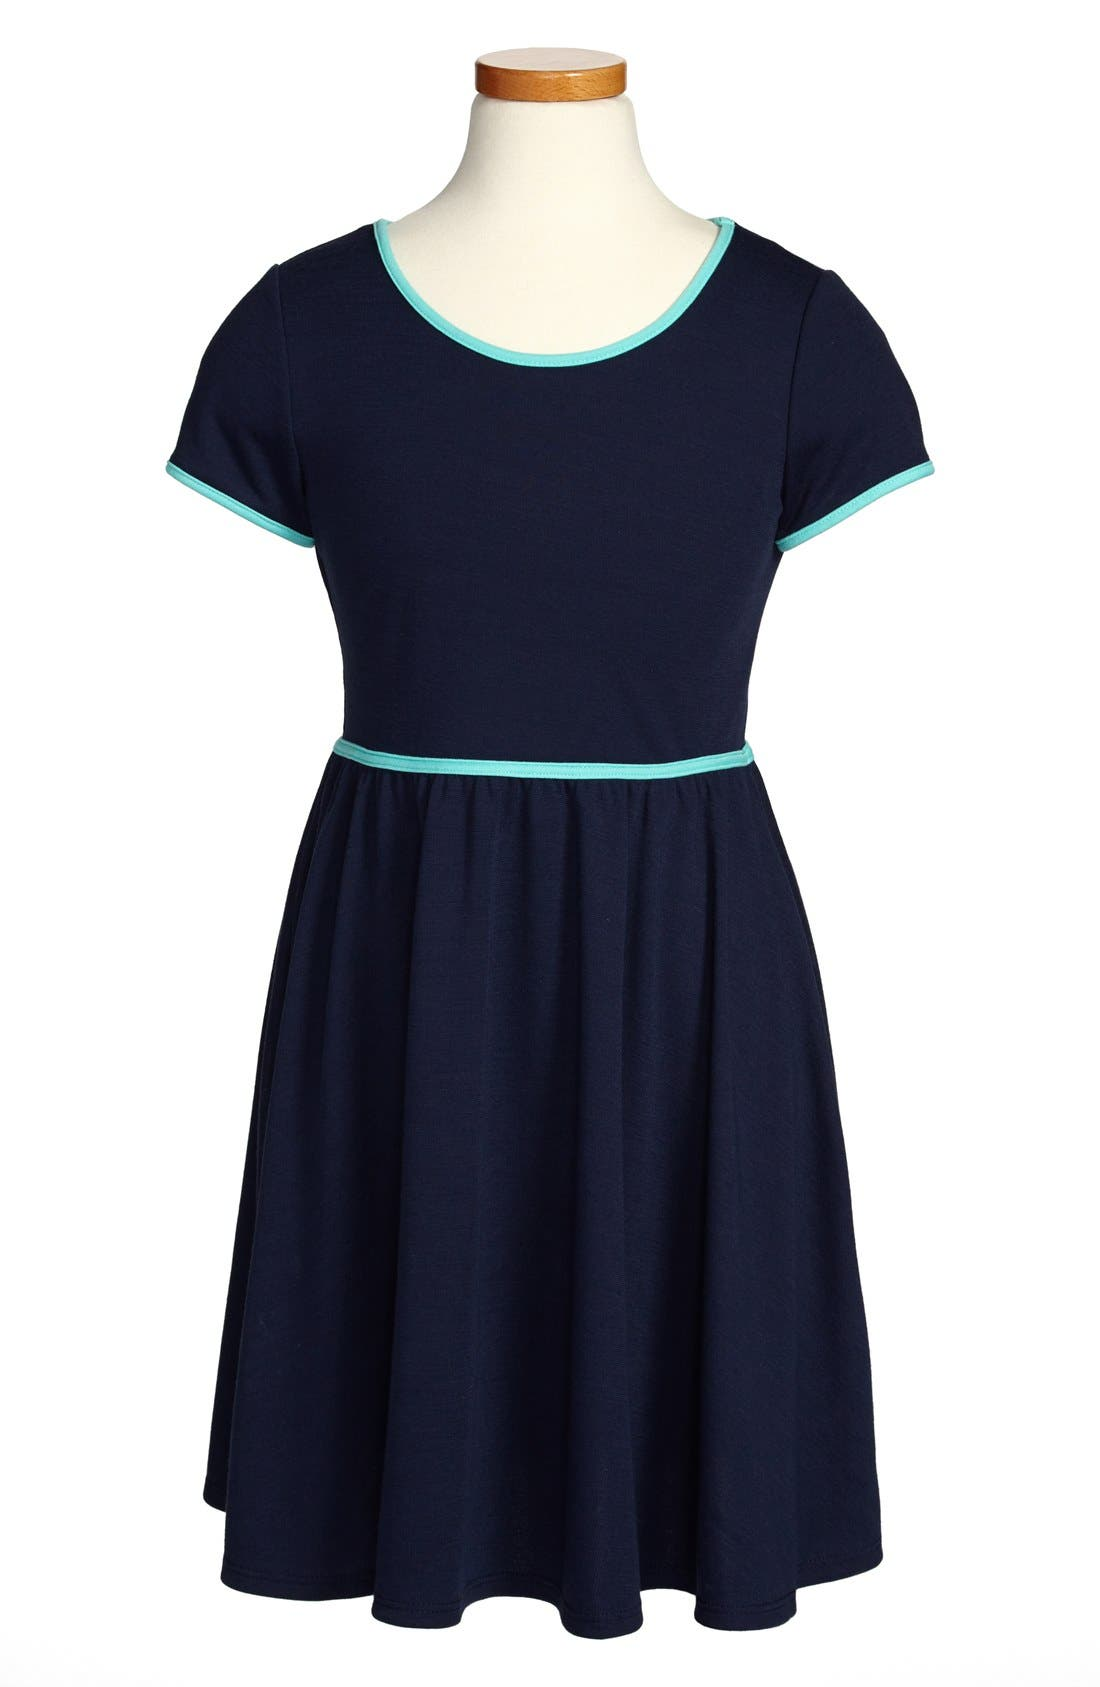 Main Image - Soprano Cap Sleeve Knit Dress (Big Girls)